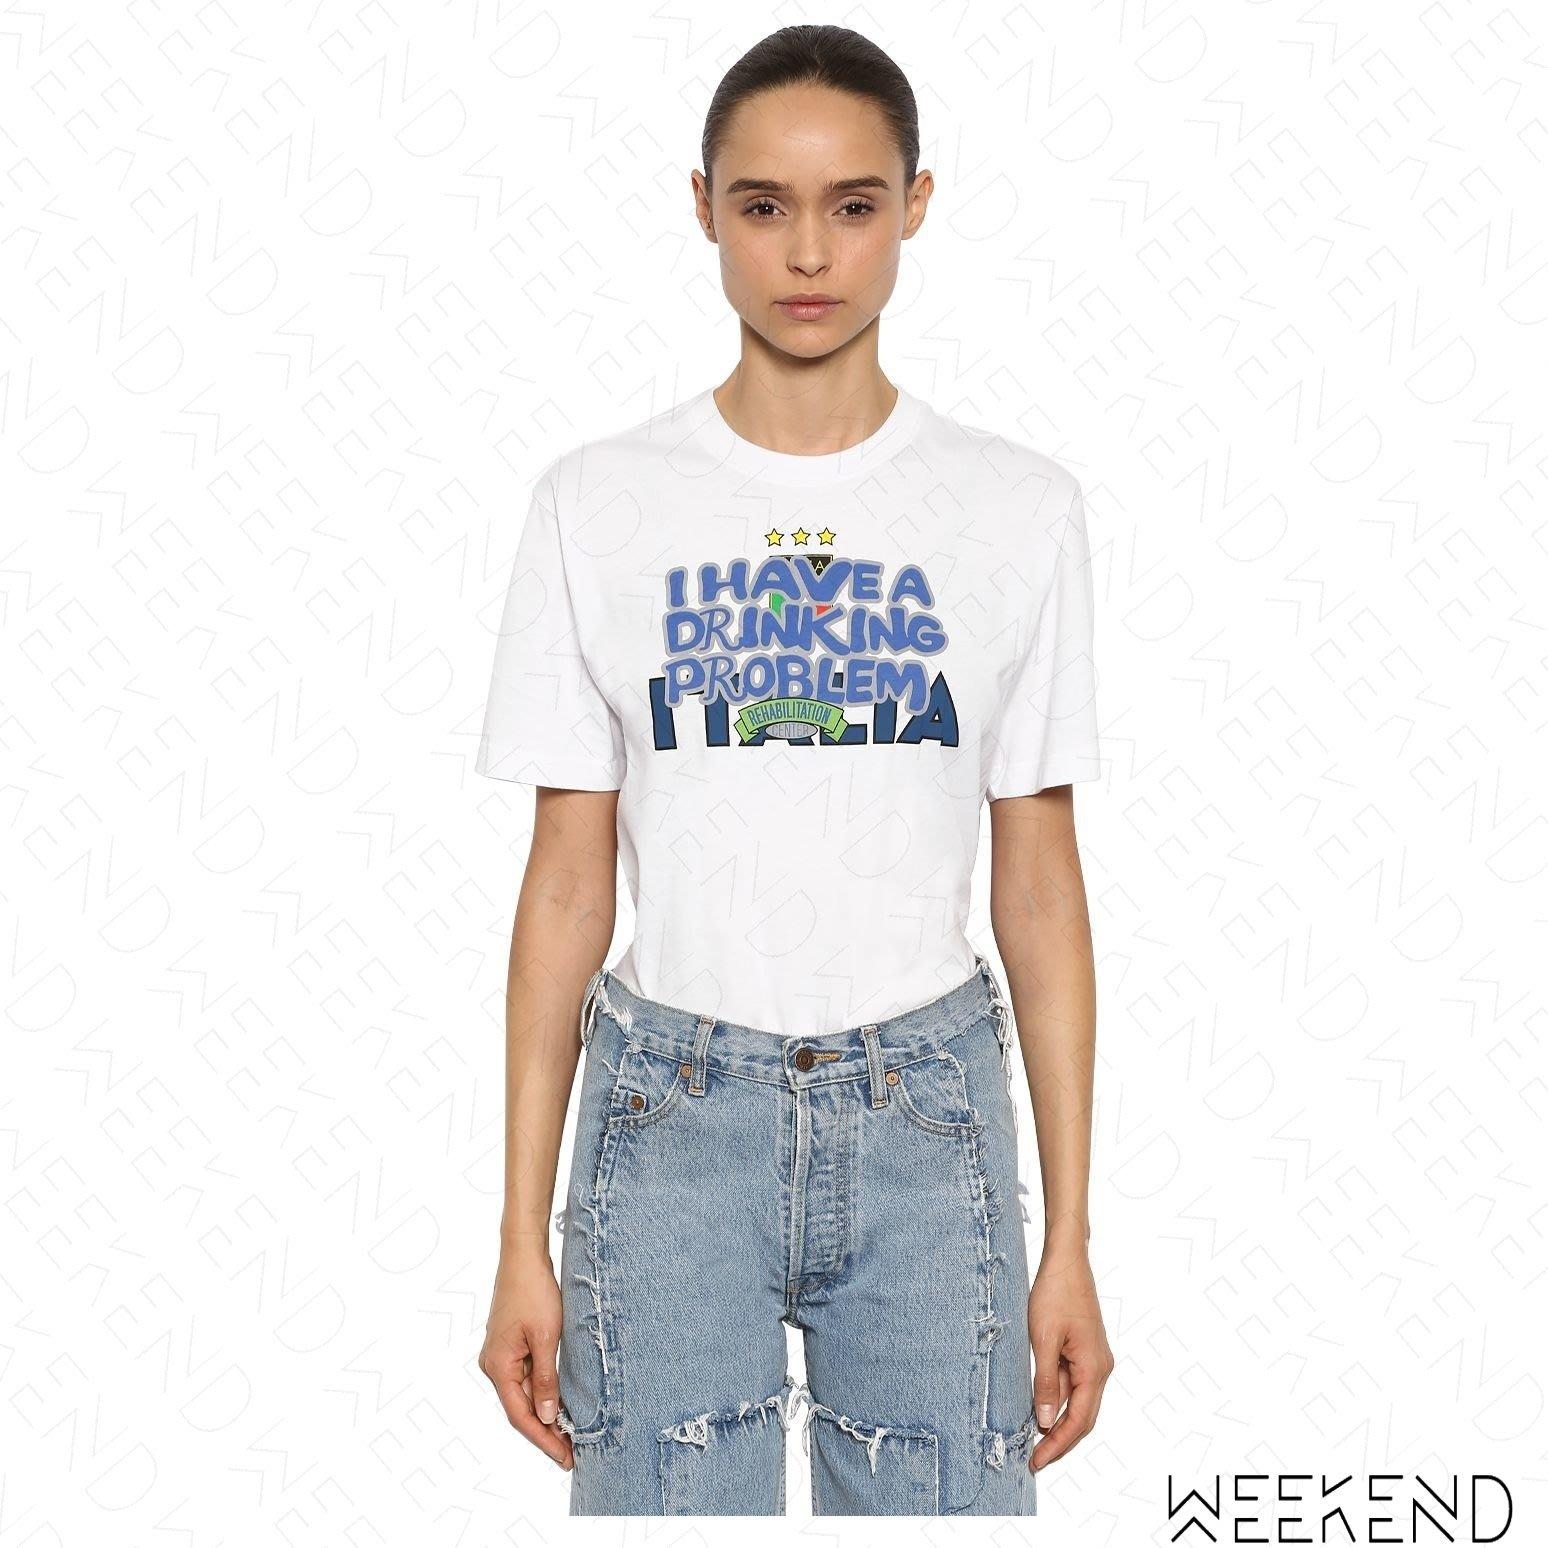 【WEEKEND】 VETEMENTS Drinking Problem 印圖 短袖 T恤 白色 18秋冬